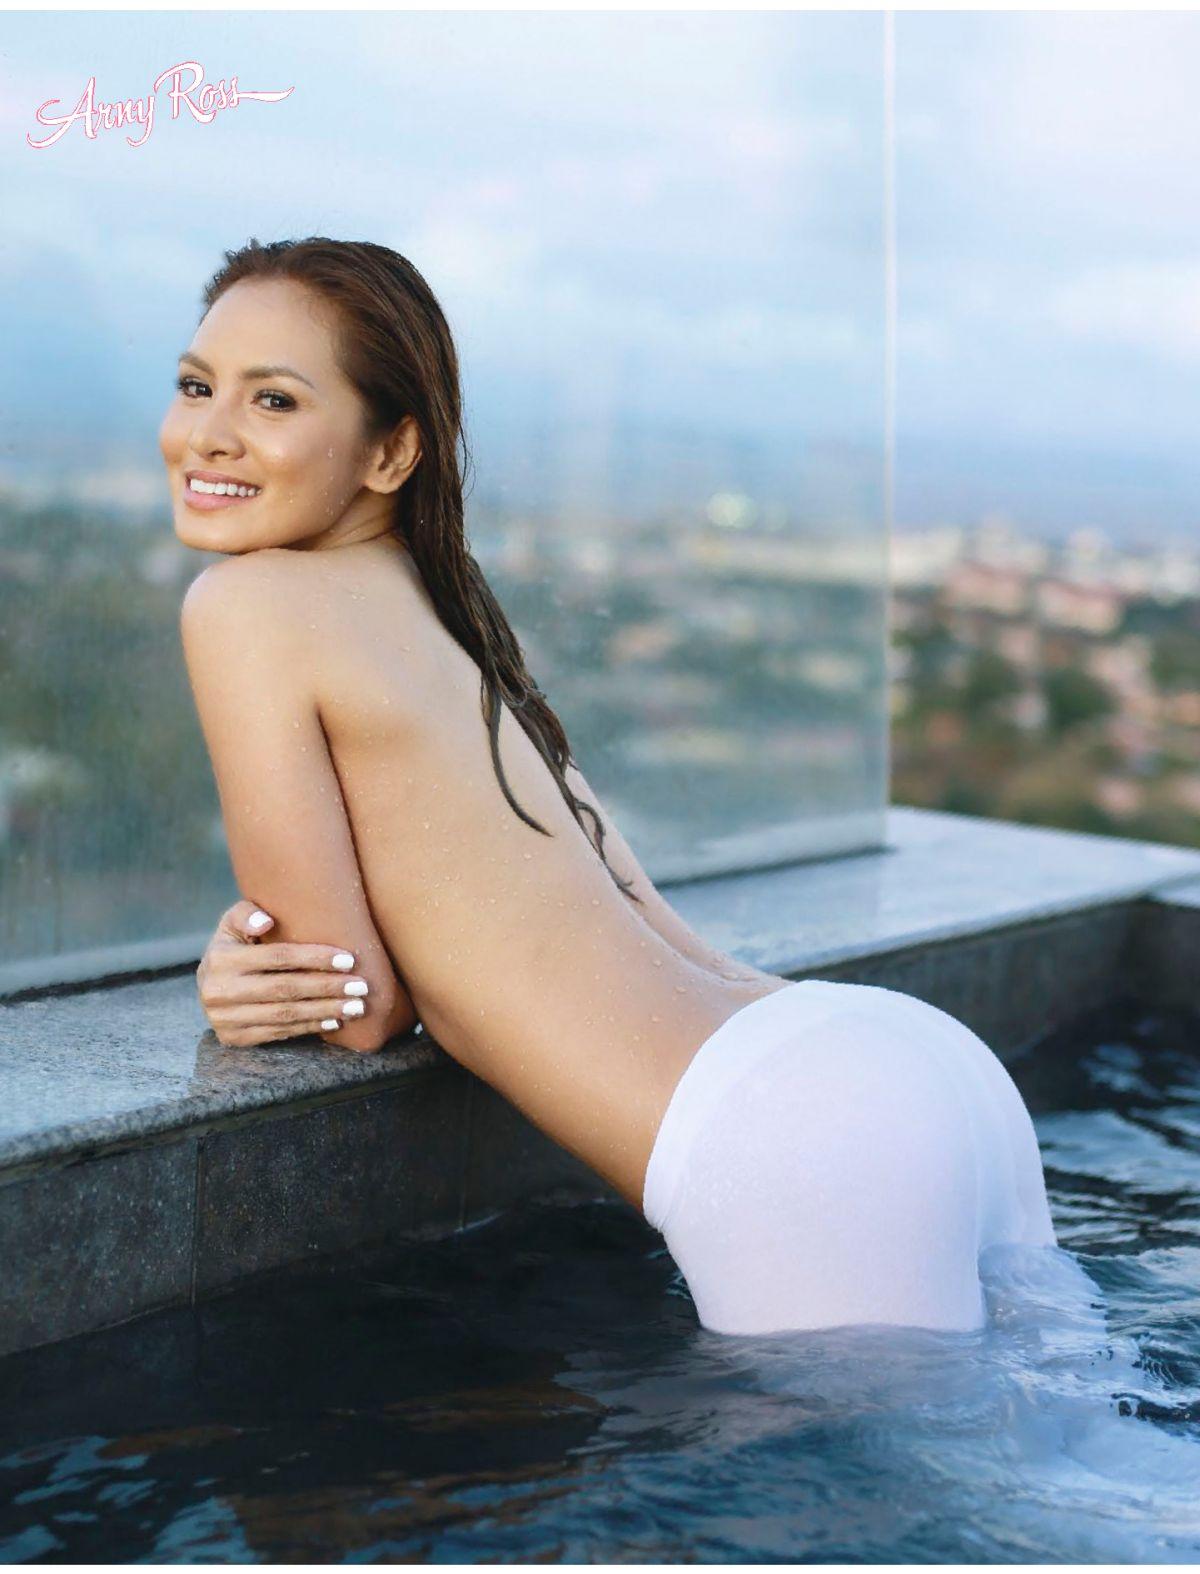 arny ross hot naked pic